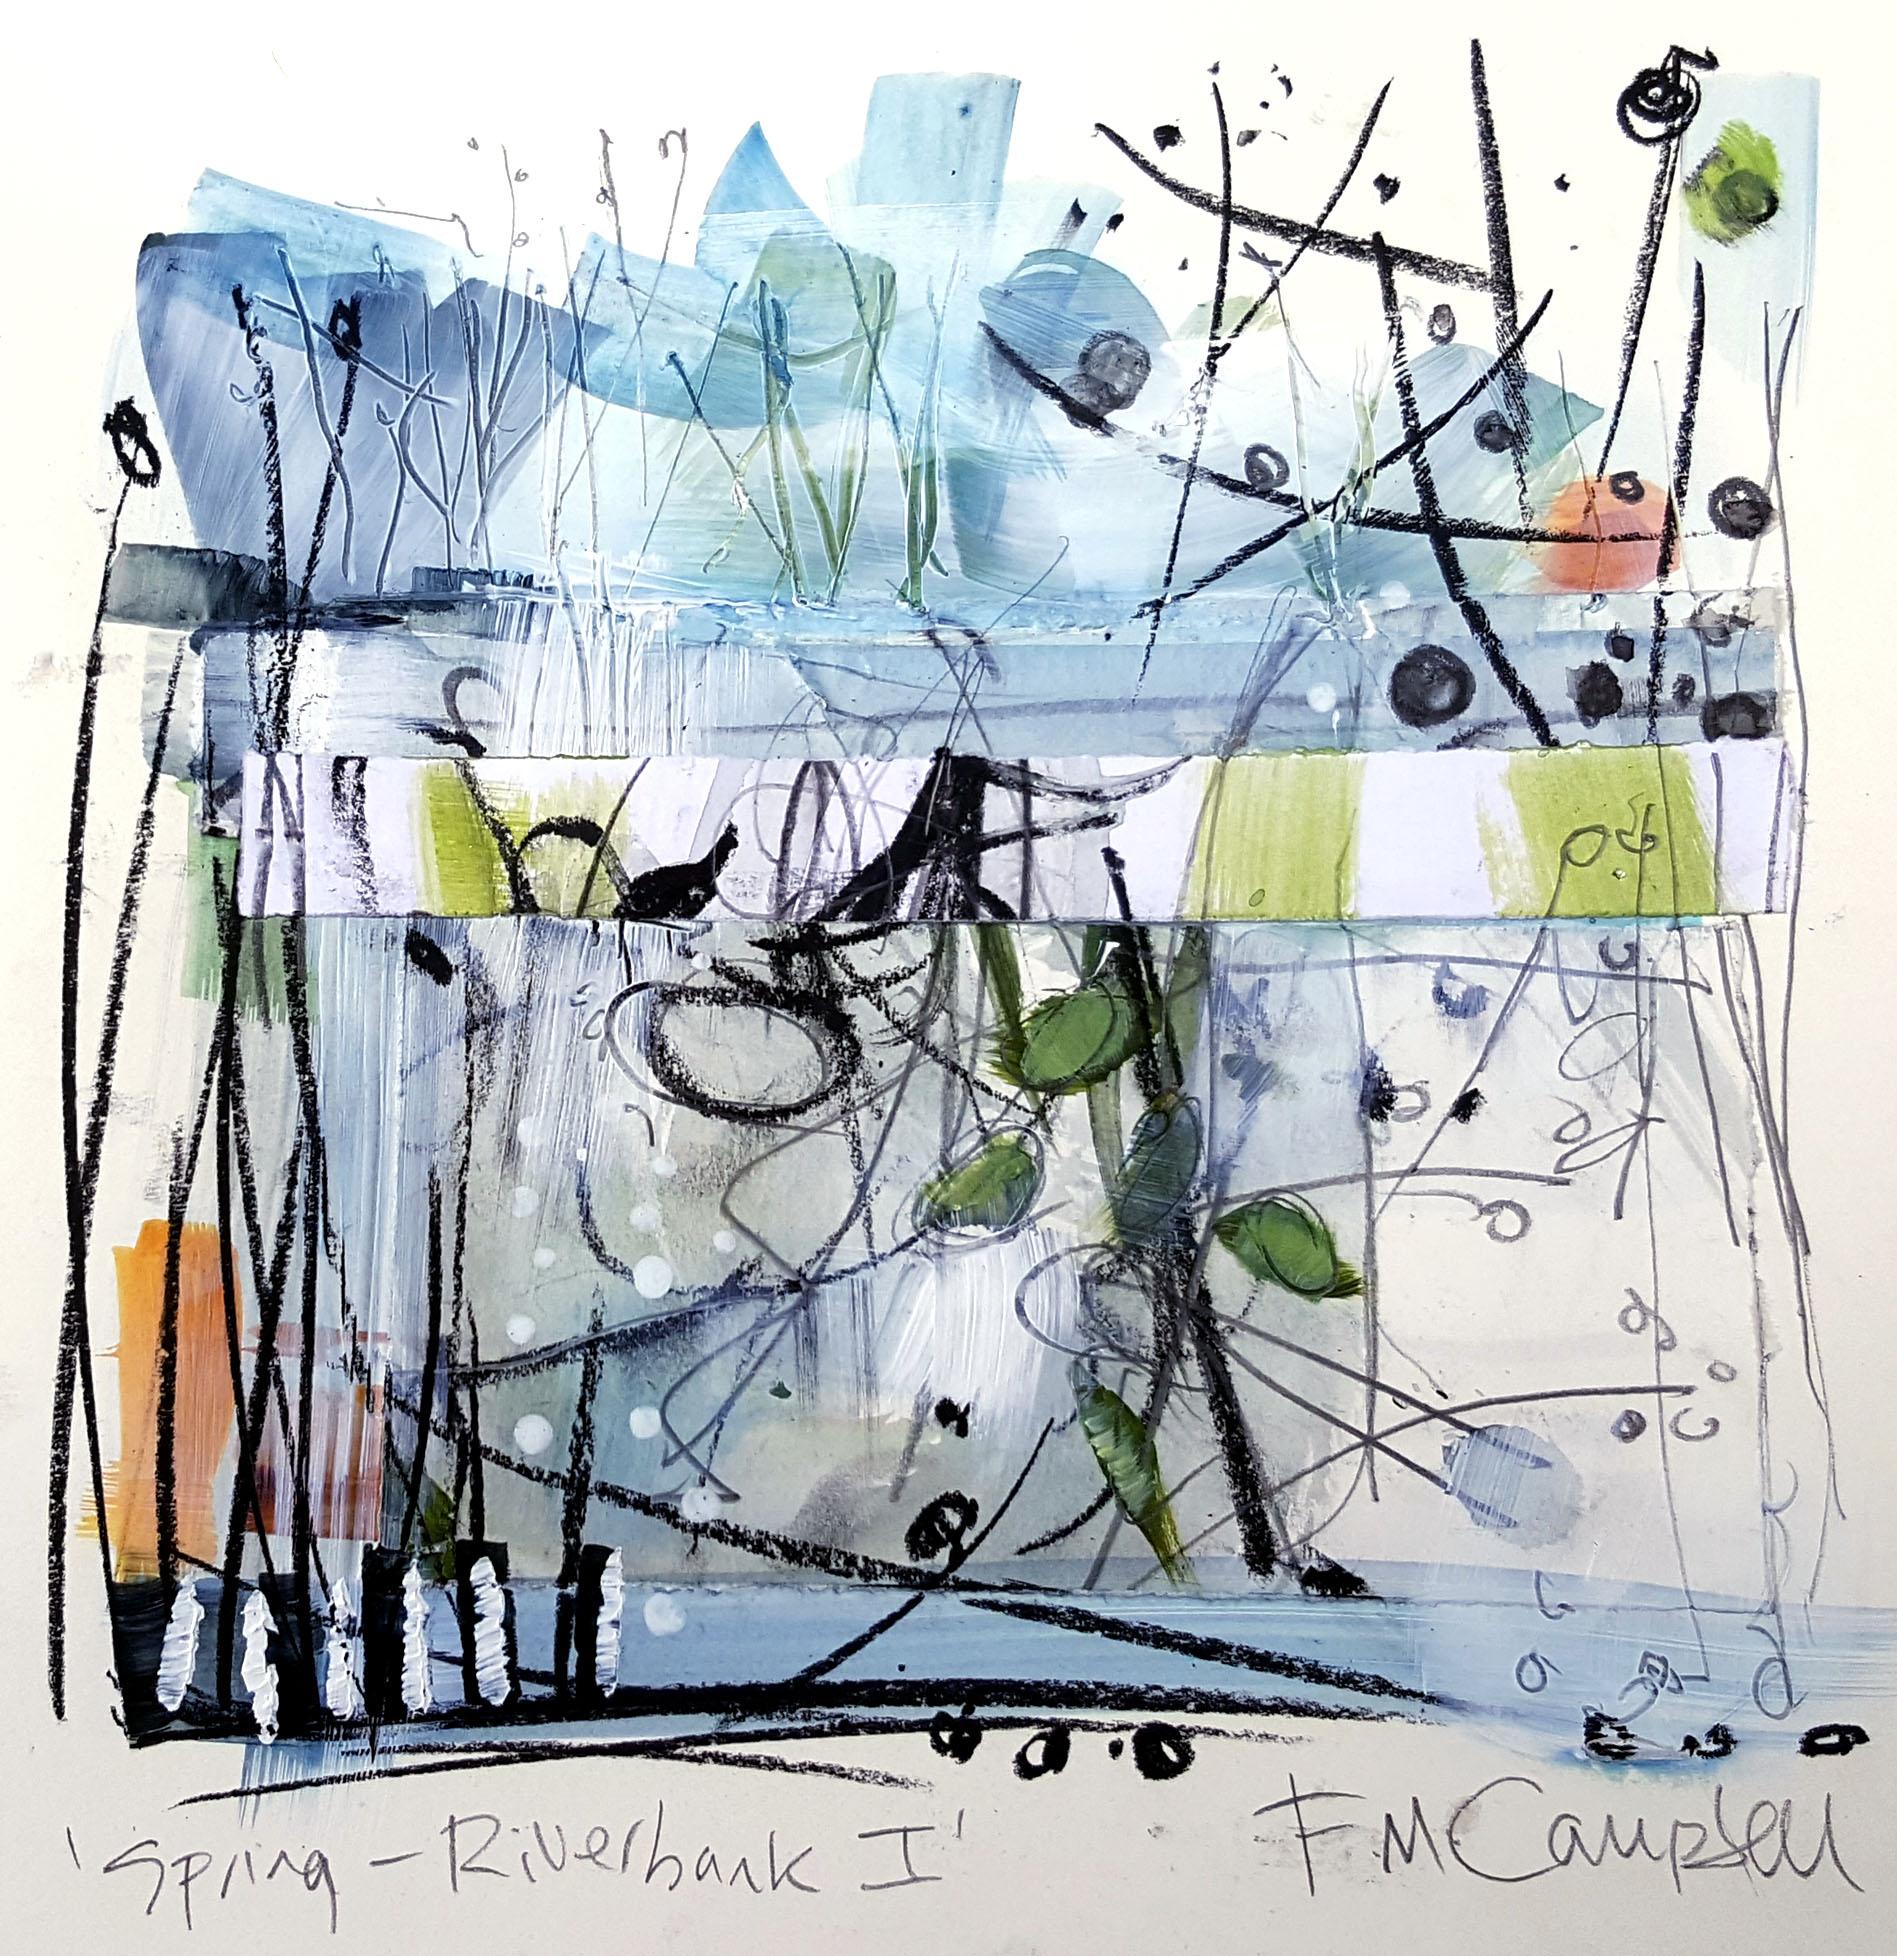 'Spring - Riverbank I'